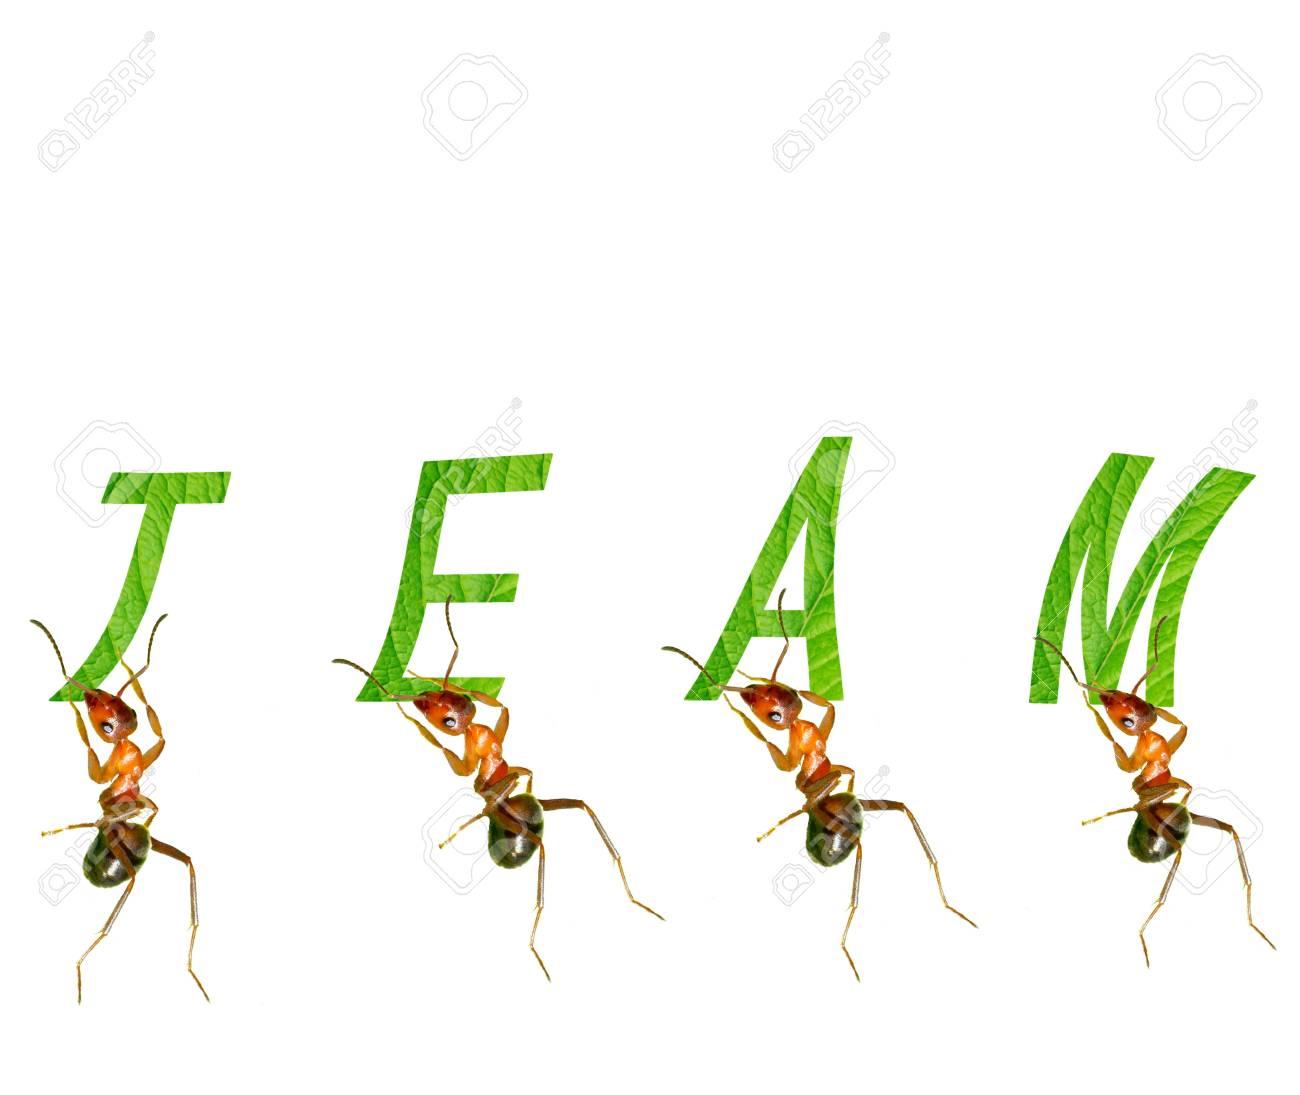 Ant tell us team of infinite power Stock Photo - 16731978